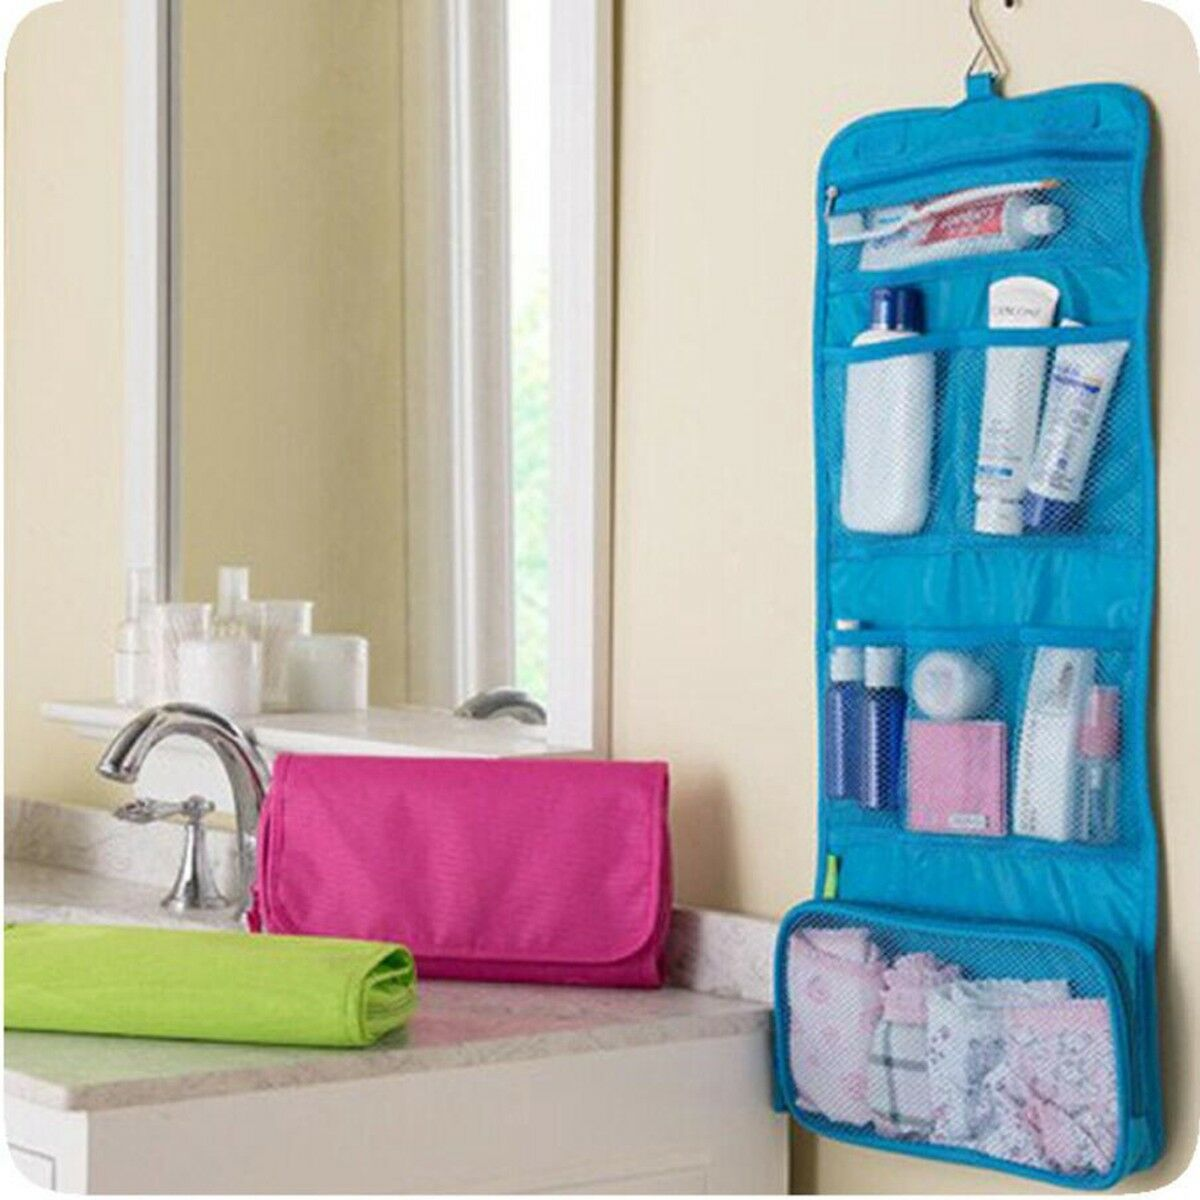 Travel Makeup Cosmetic Bathroom Toiletry Wash Shower Storage